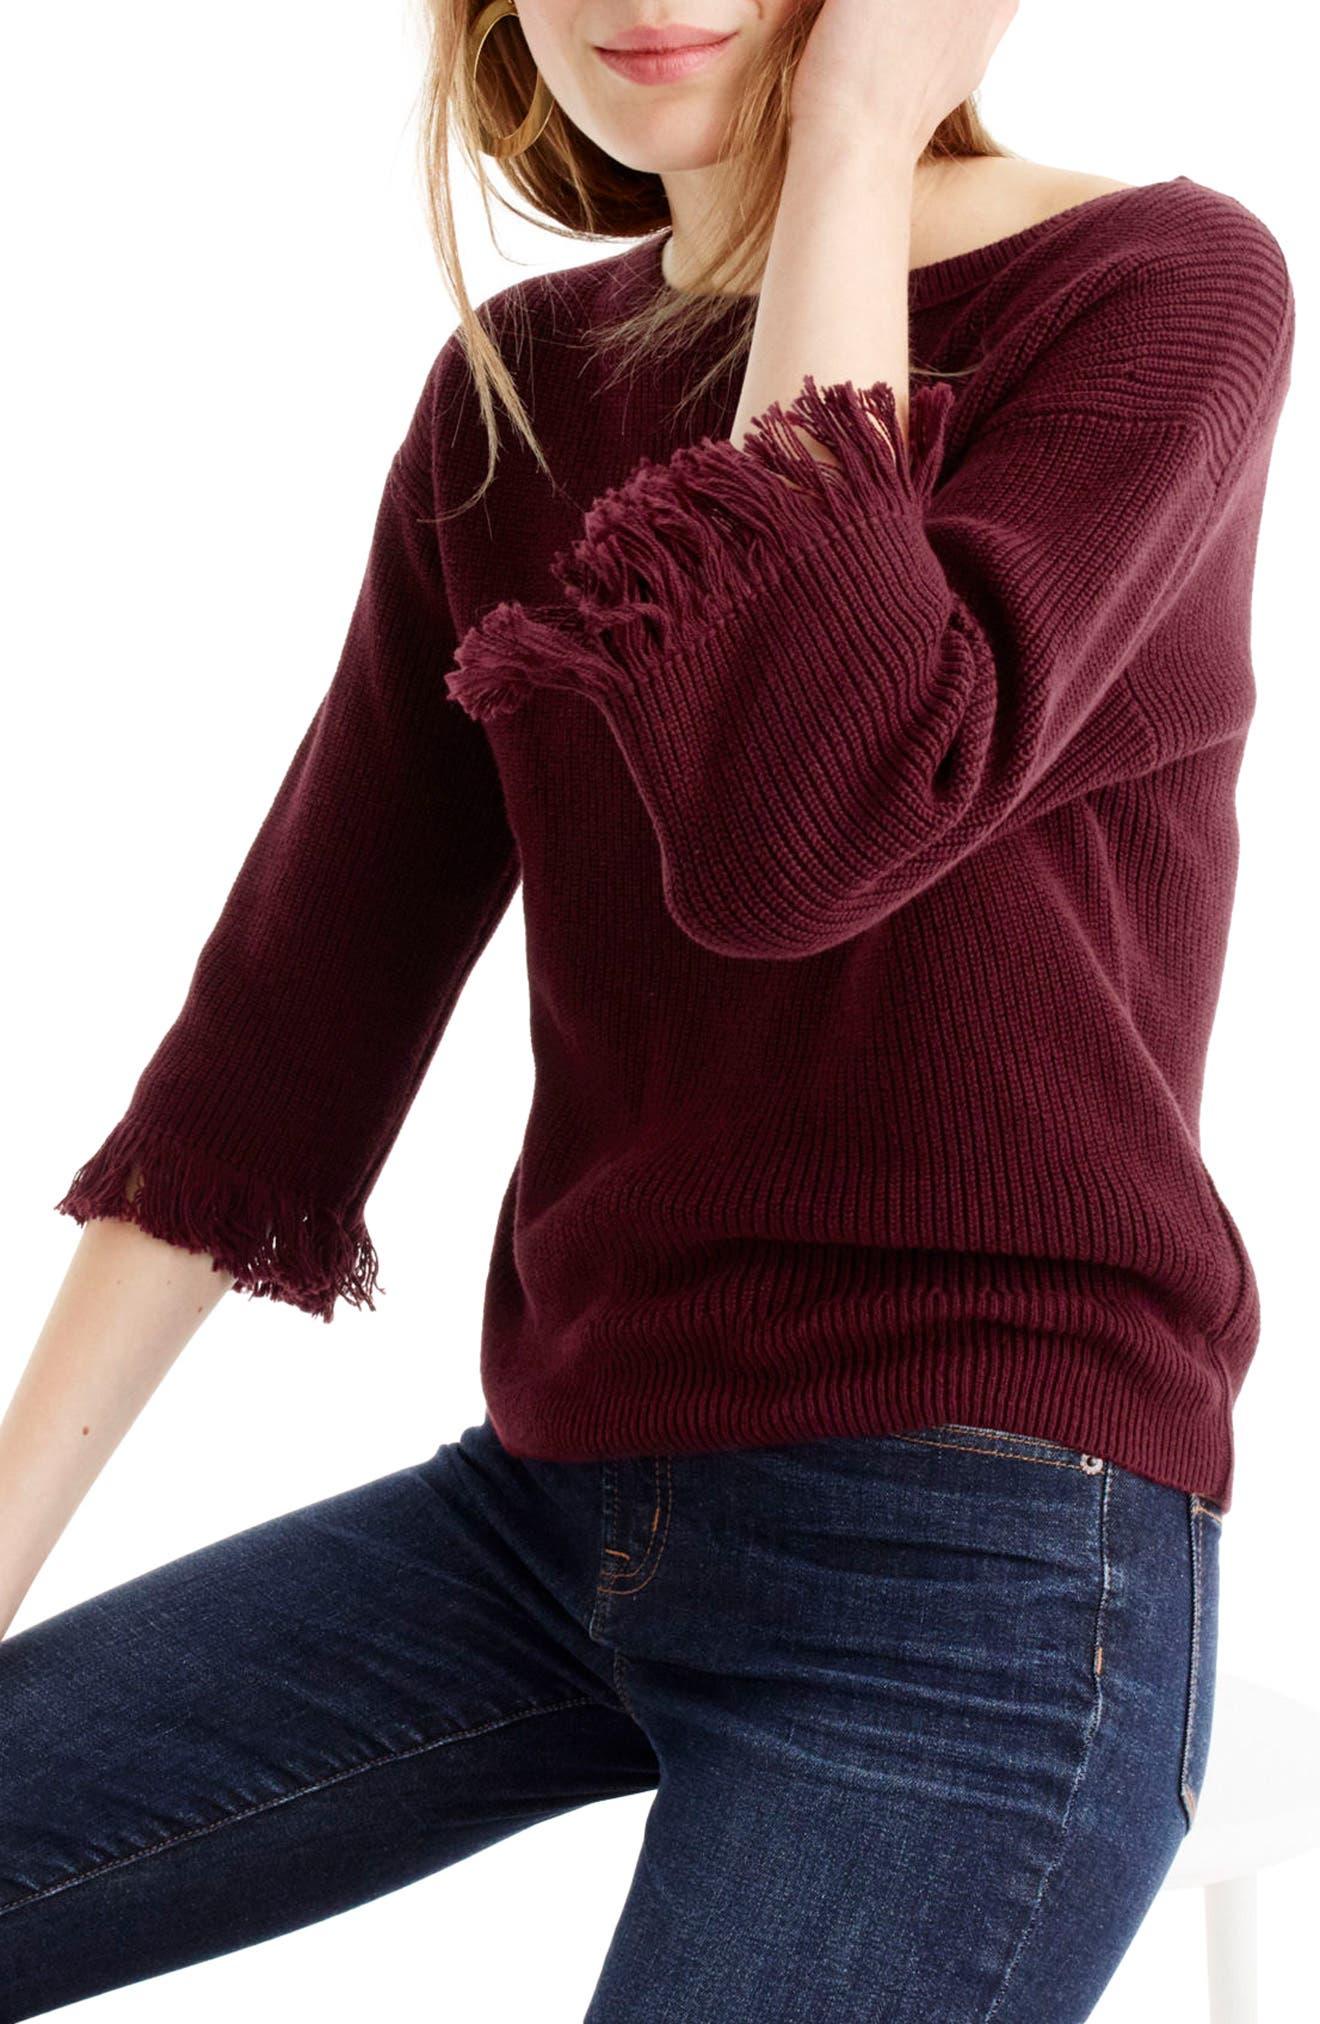 J.Crew Fringe Crewneck Sweater